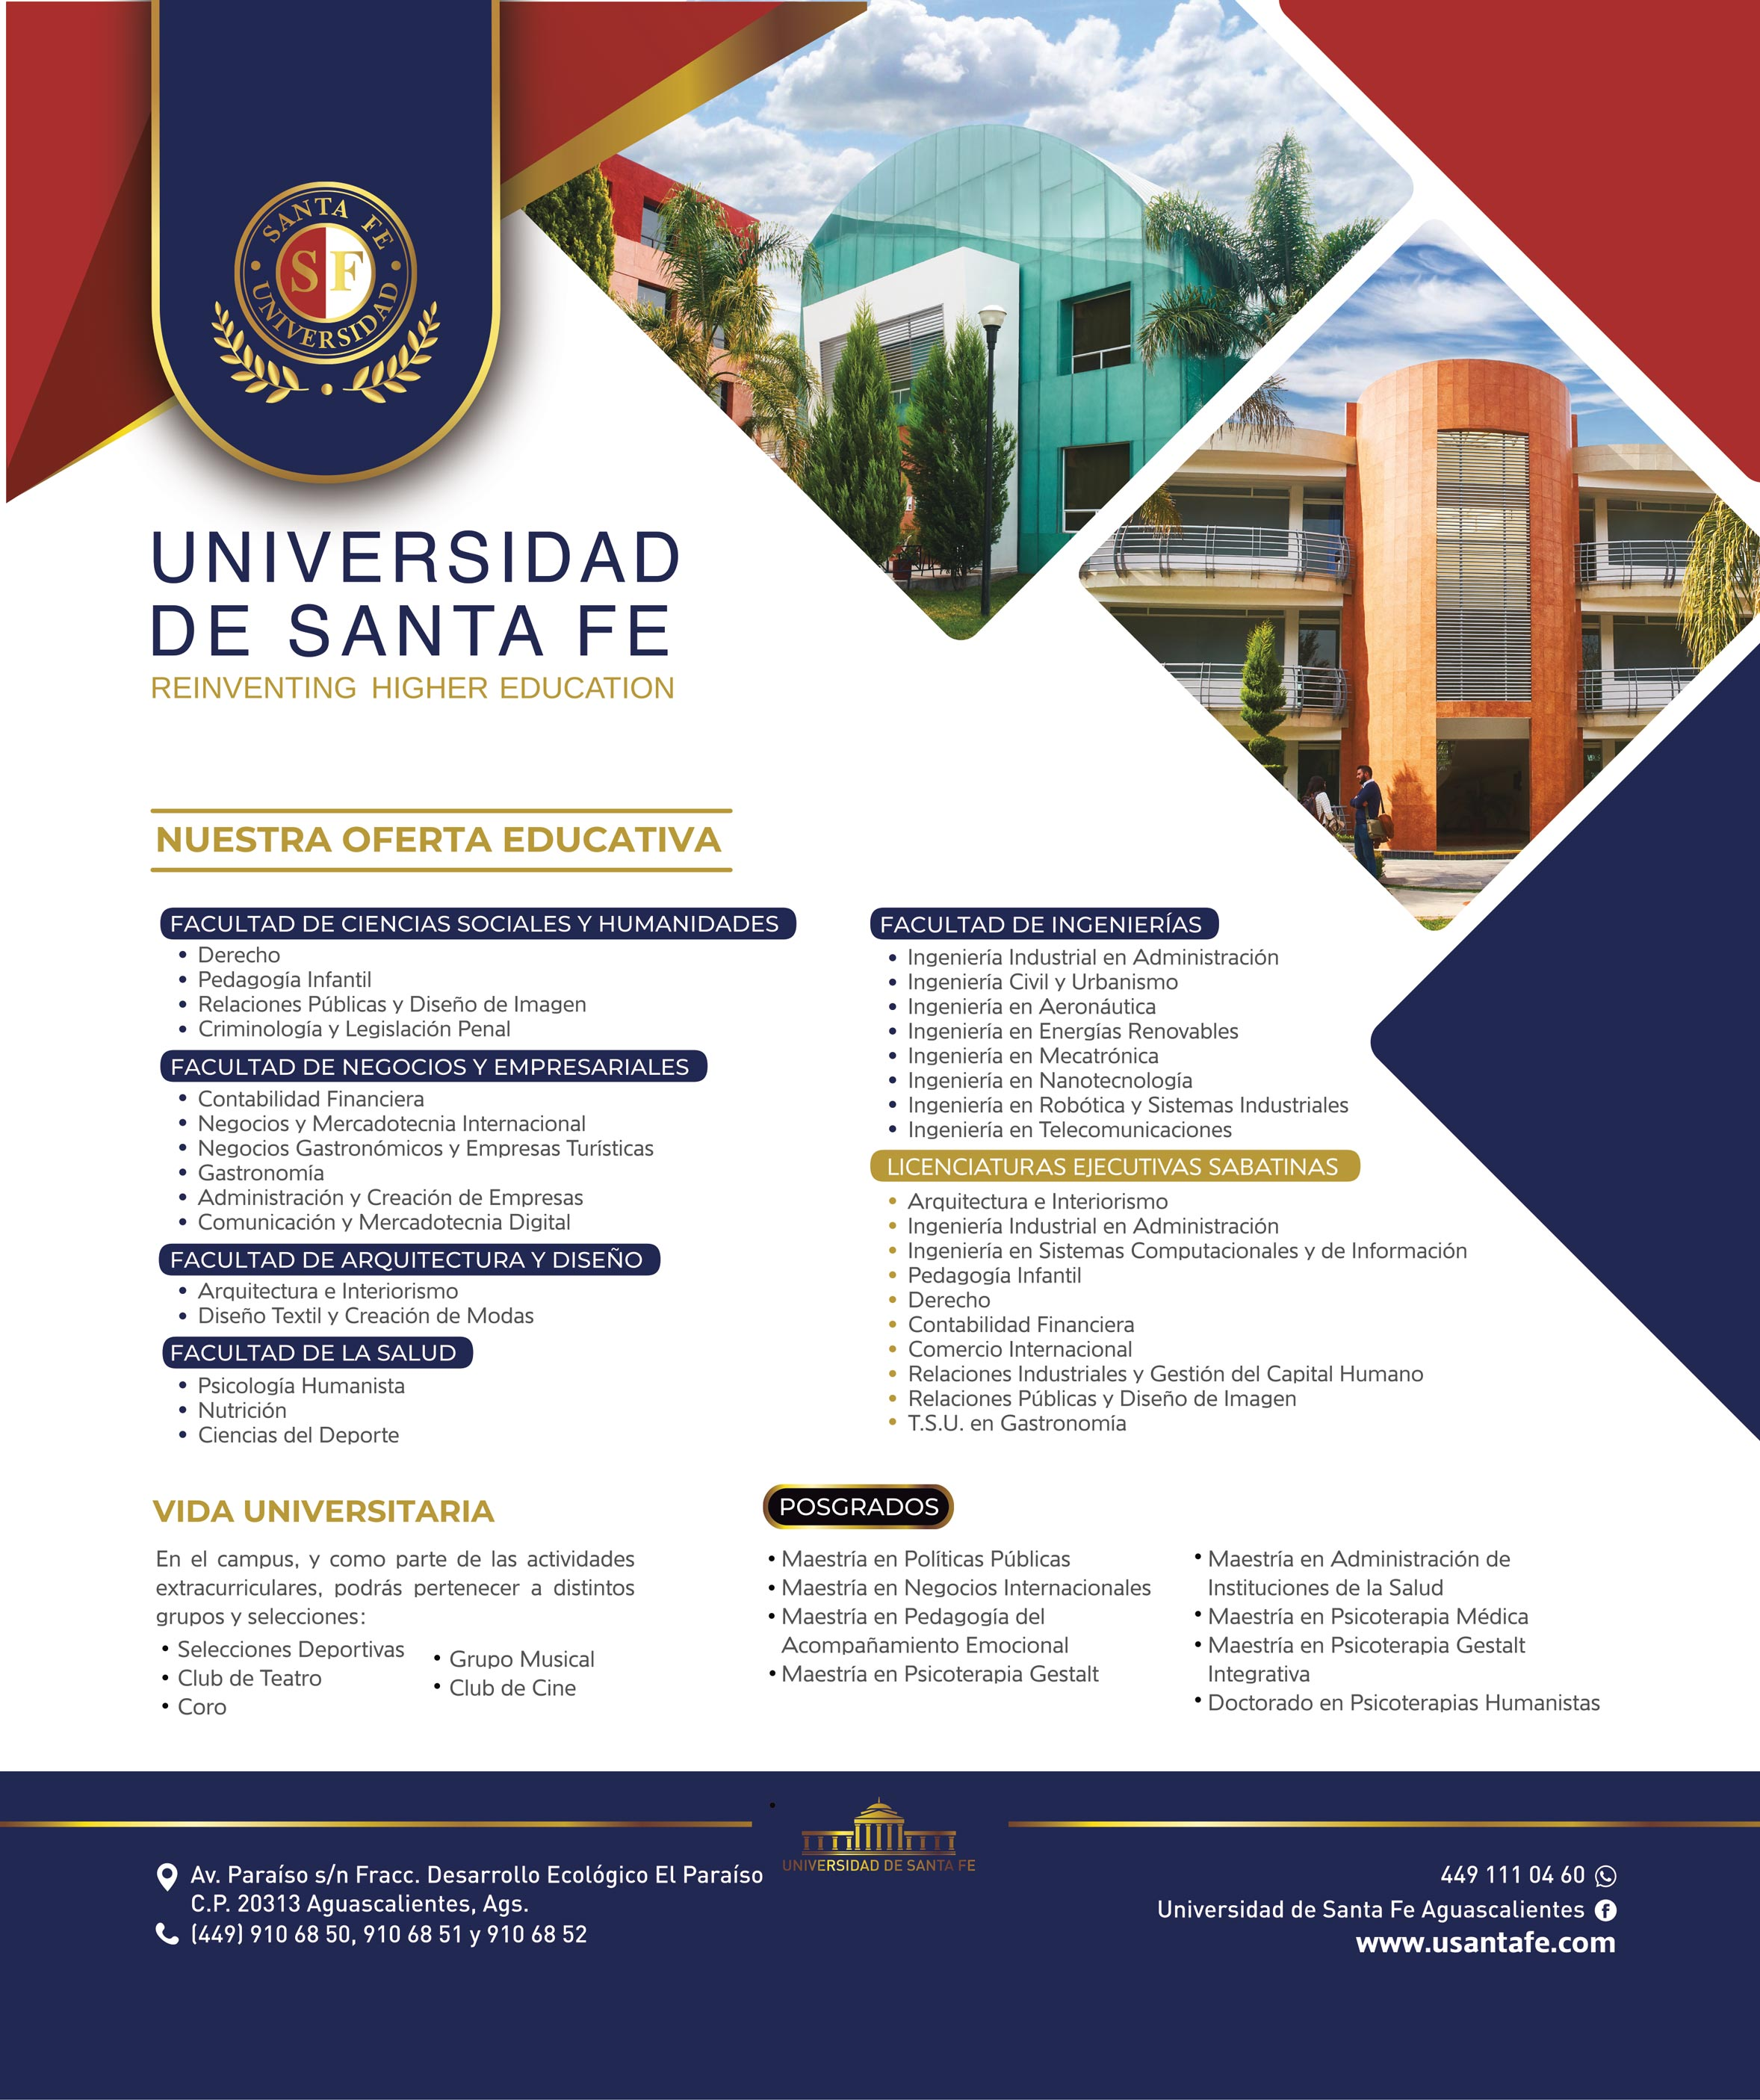 UNIVERSIDAD-SANTA-FE